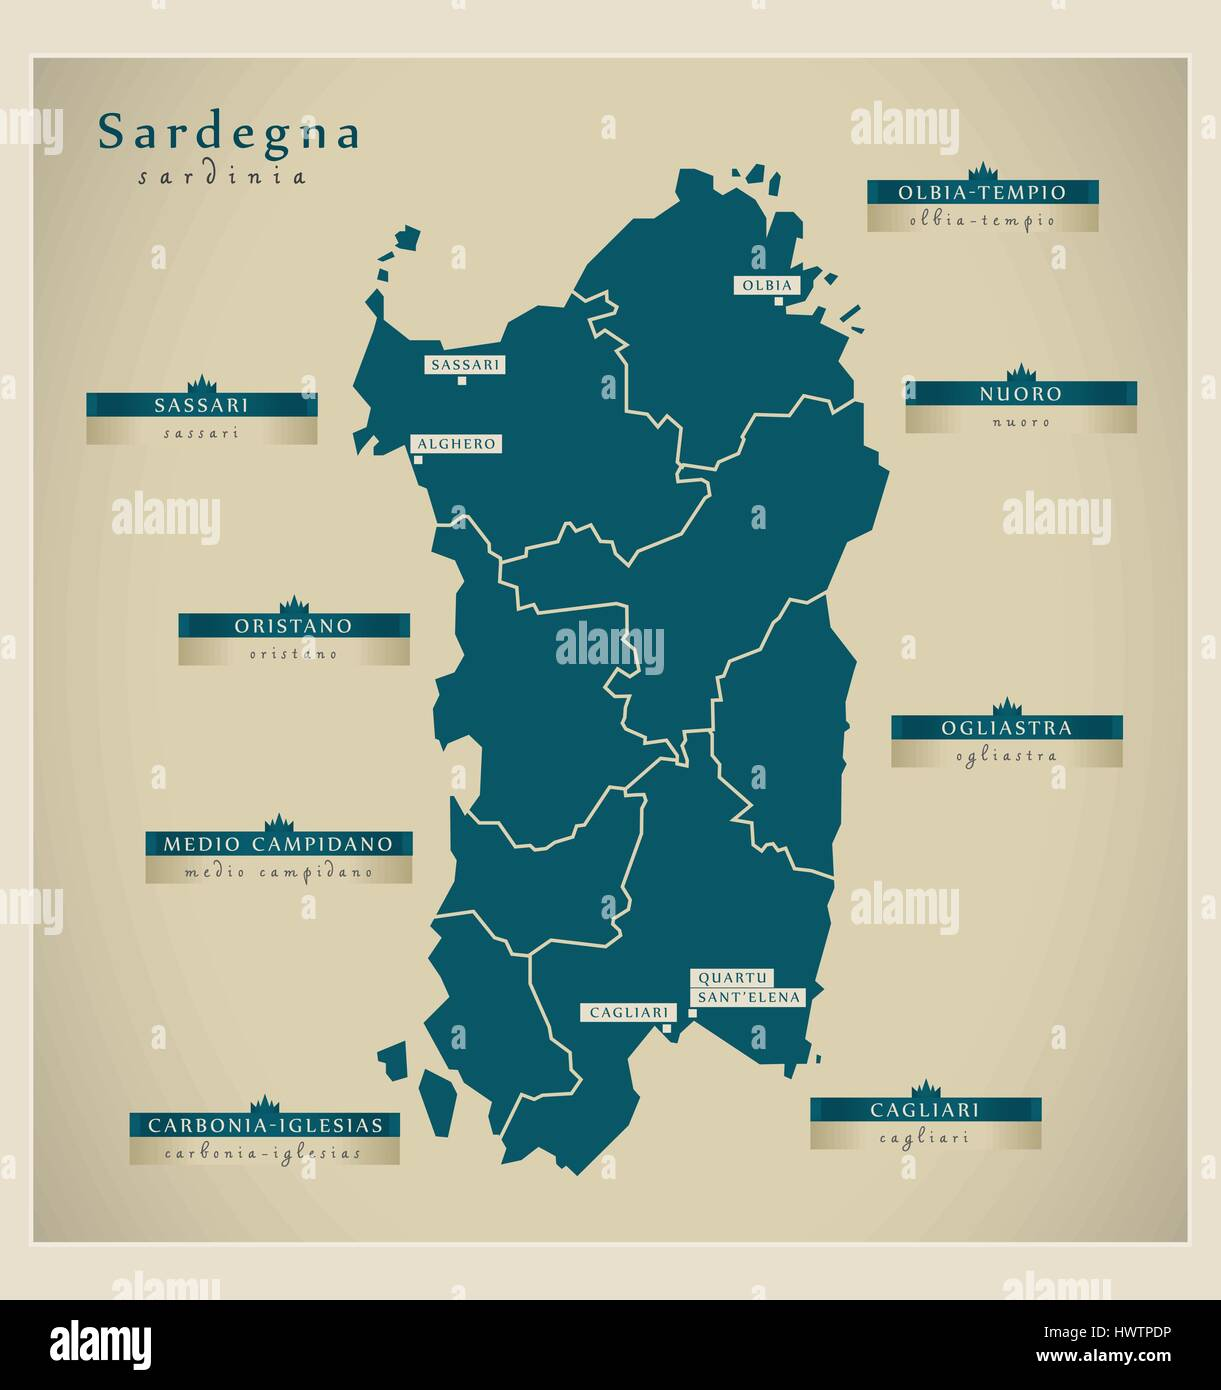 Cartina Sardegna Vettoriale.Modern Map Sardegna It Stock Vector Image Art Alamy